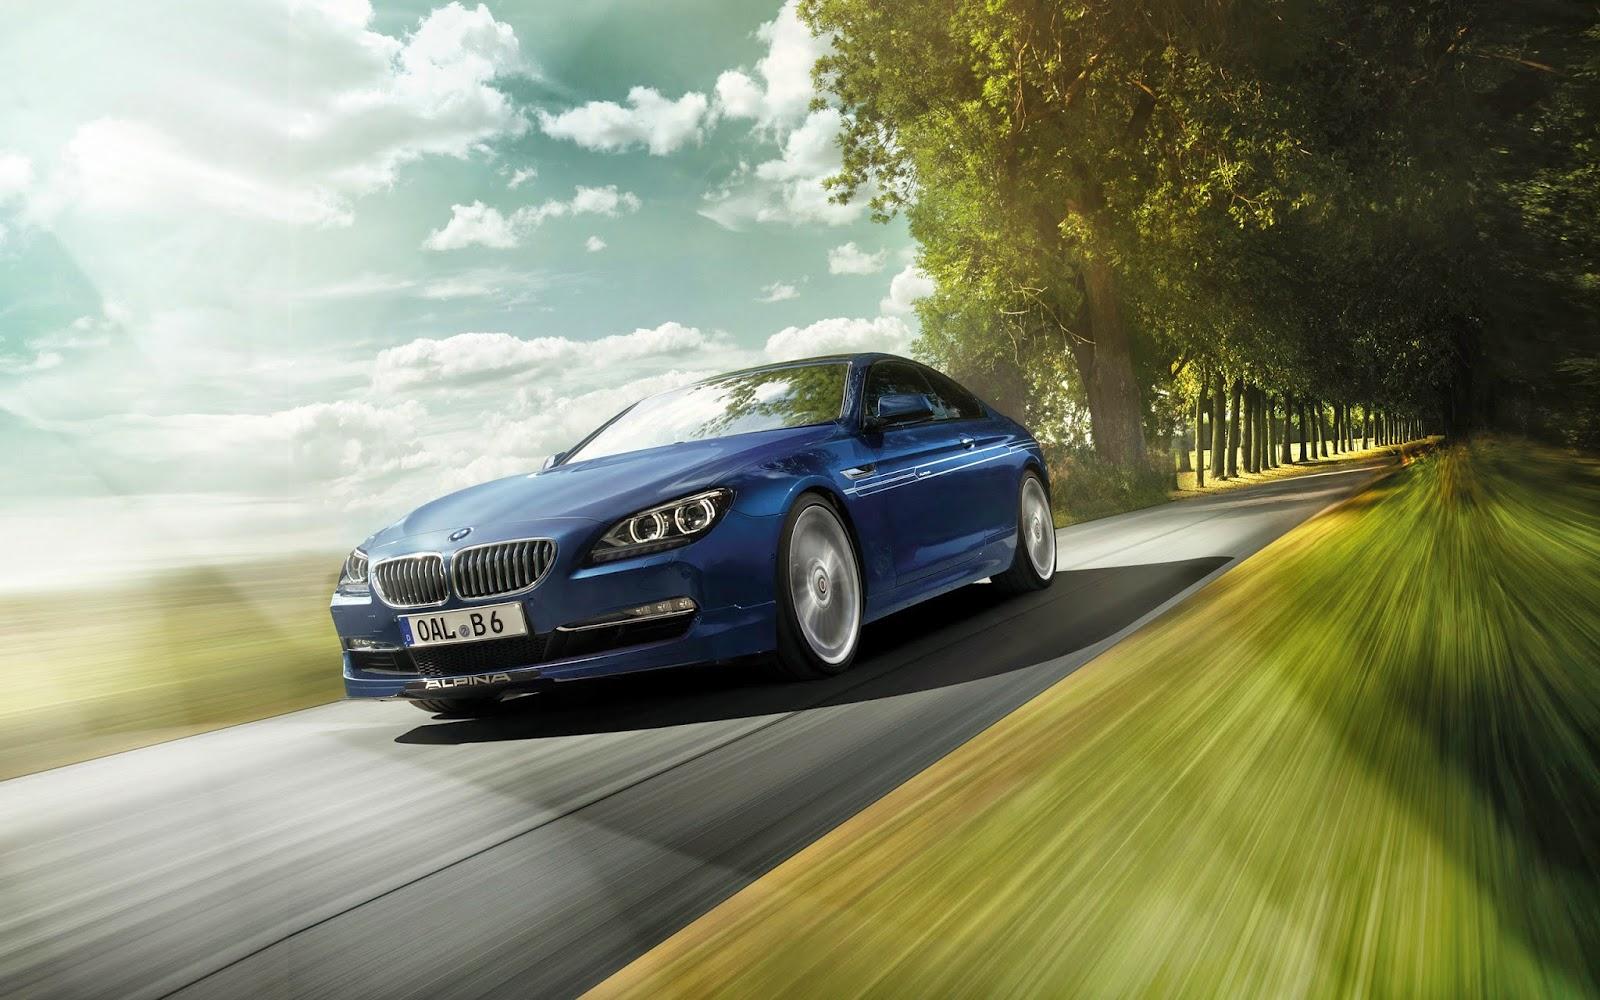 "<img src=""http://1.bp.blogspot.com/-gffp0H1Ytfo/UzM1EQFFH3I/AAAAAAAALOM/z68UdXf5tRg/s1600/bmw-car-wallpapers.jpg"" alt=""BMW Wallpapers"" />"